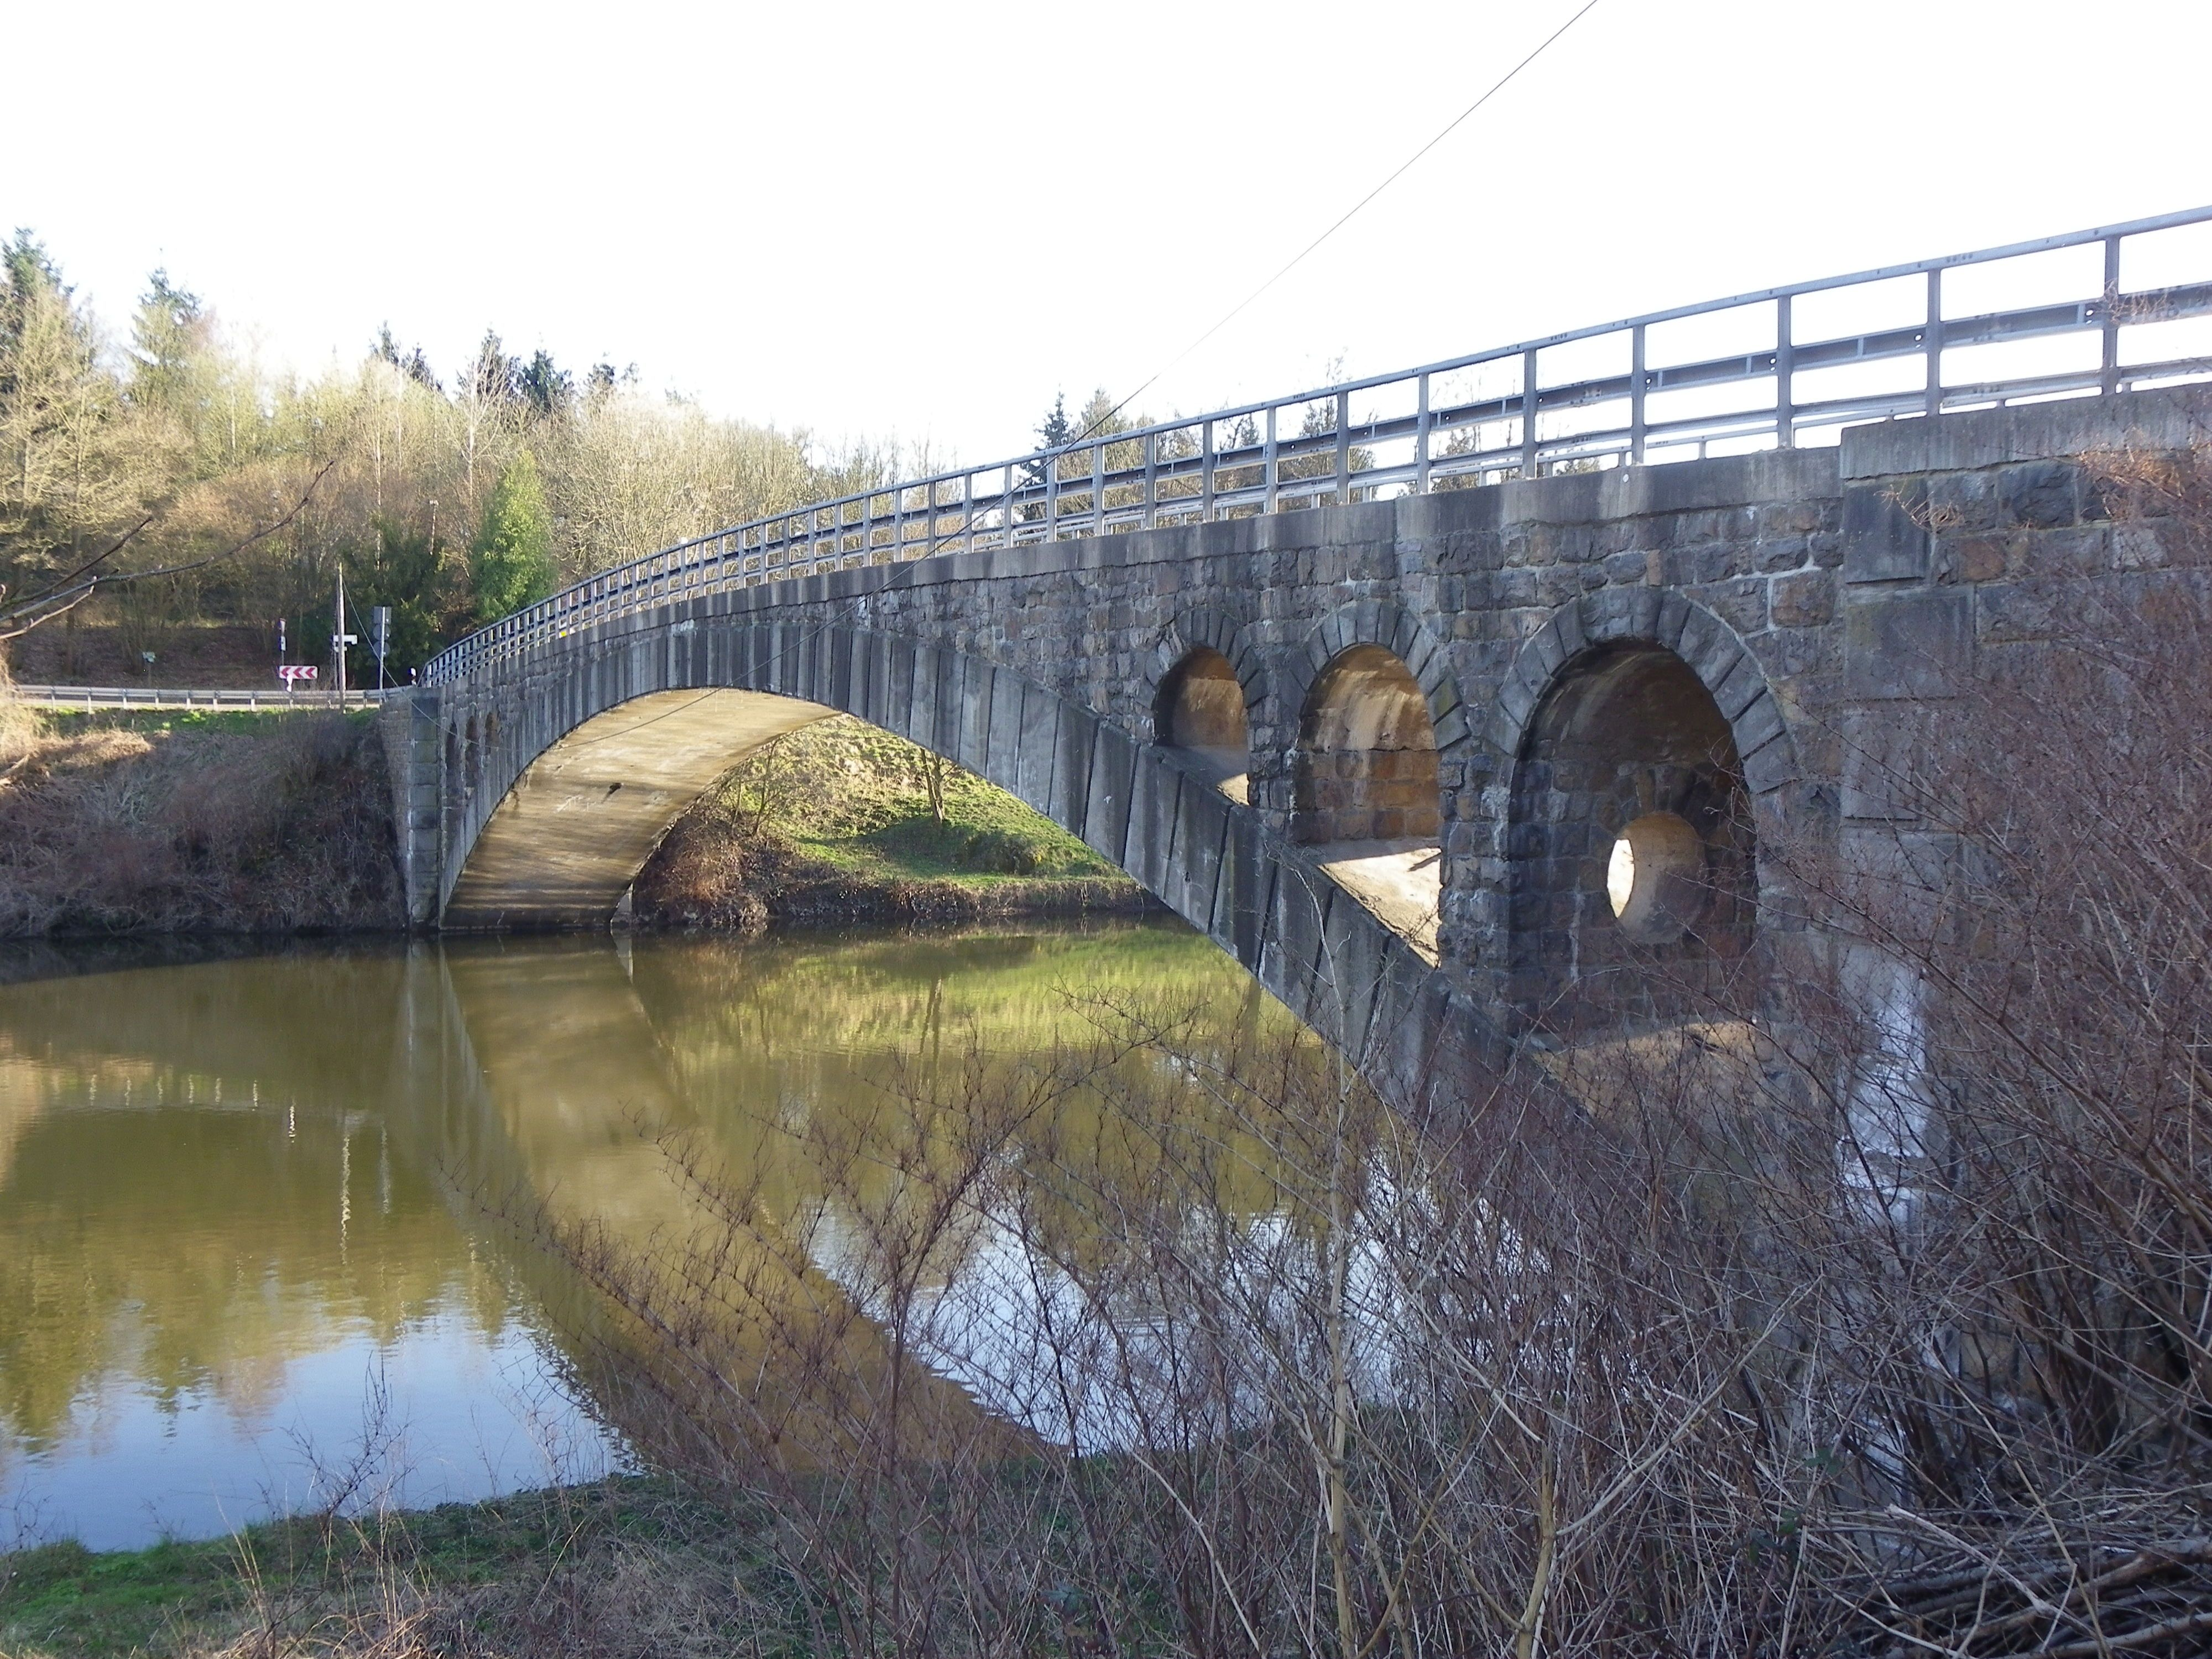 waldcafe bridge